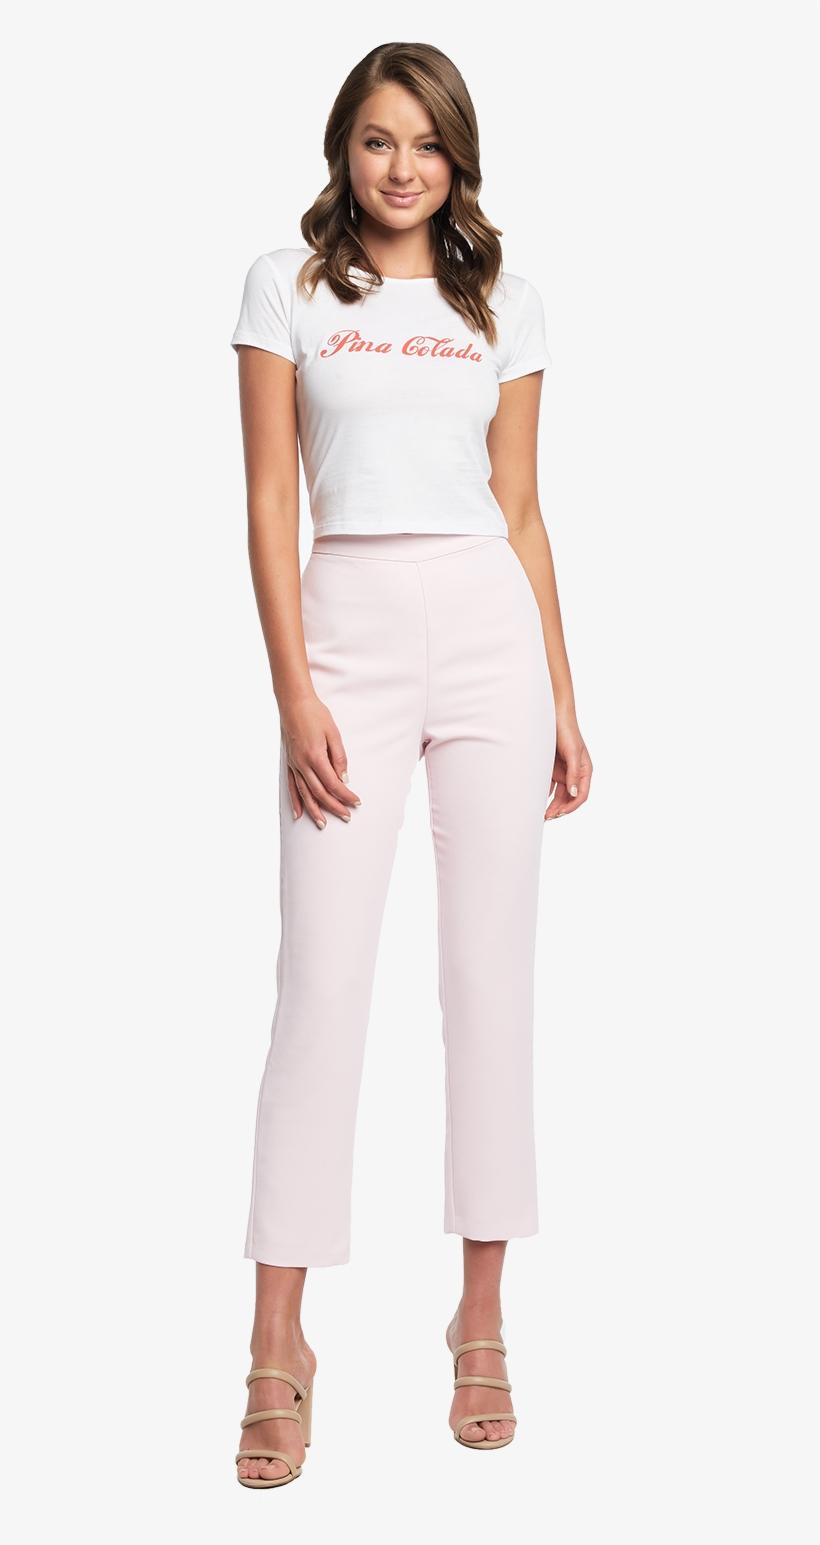 Roblox Blush Pants Zalia Slim Pant In Colour Blushing Bride Girl Transparent Png